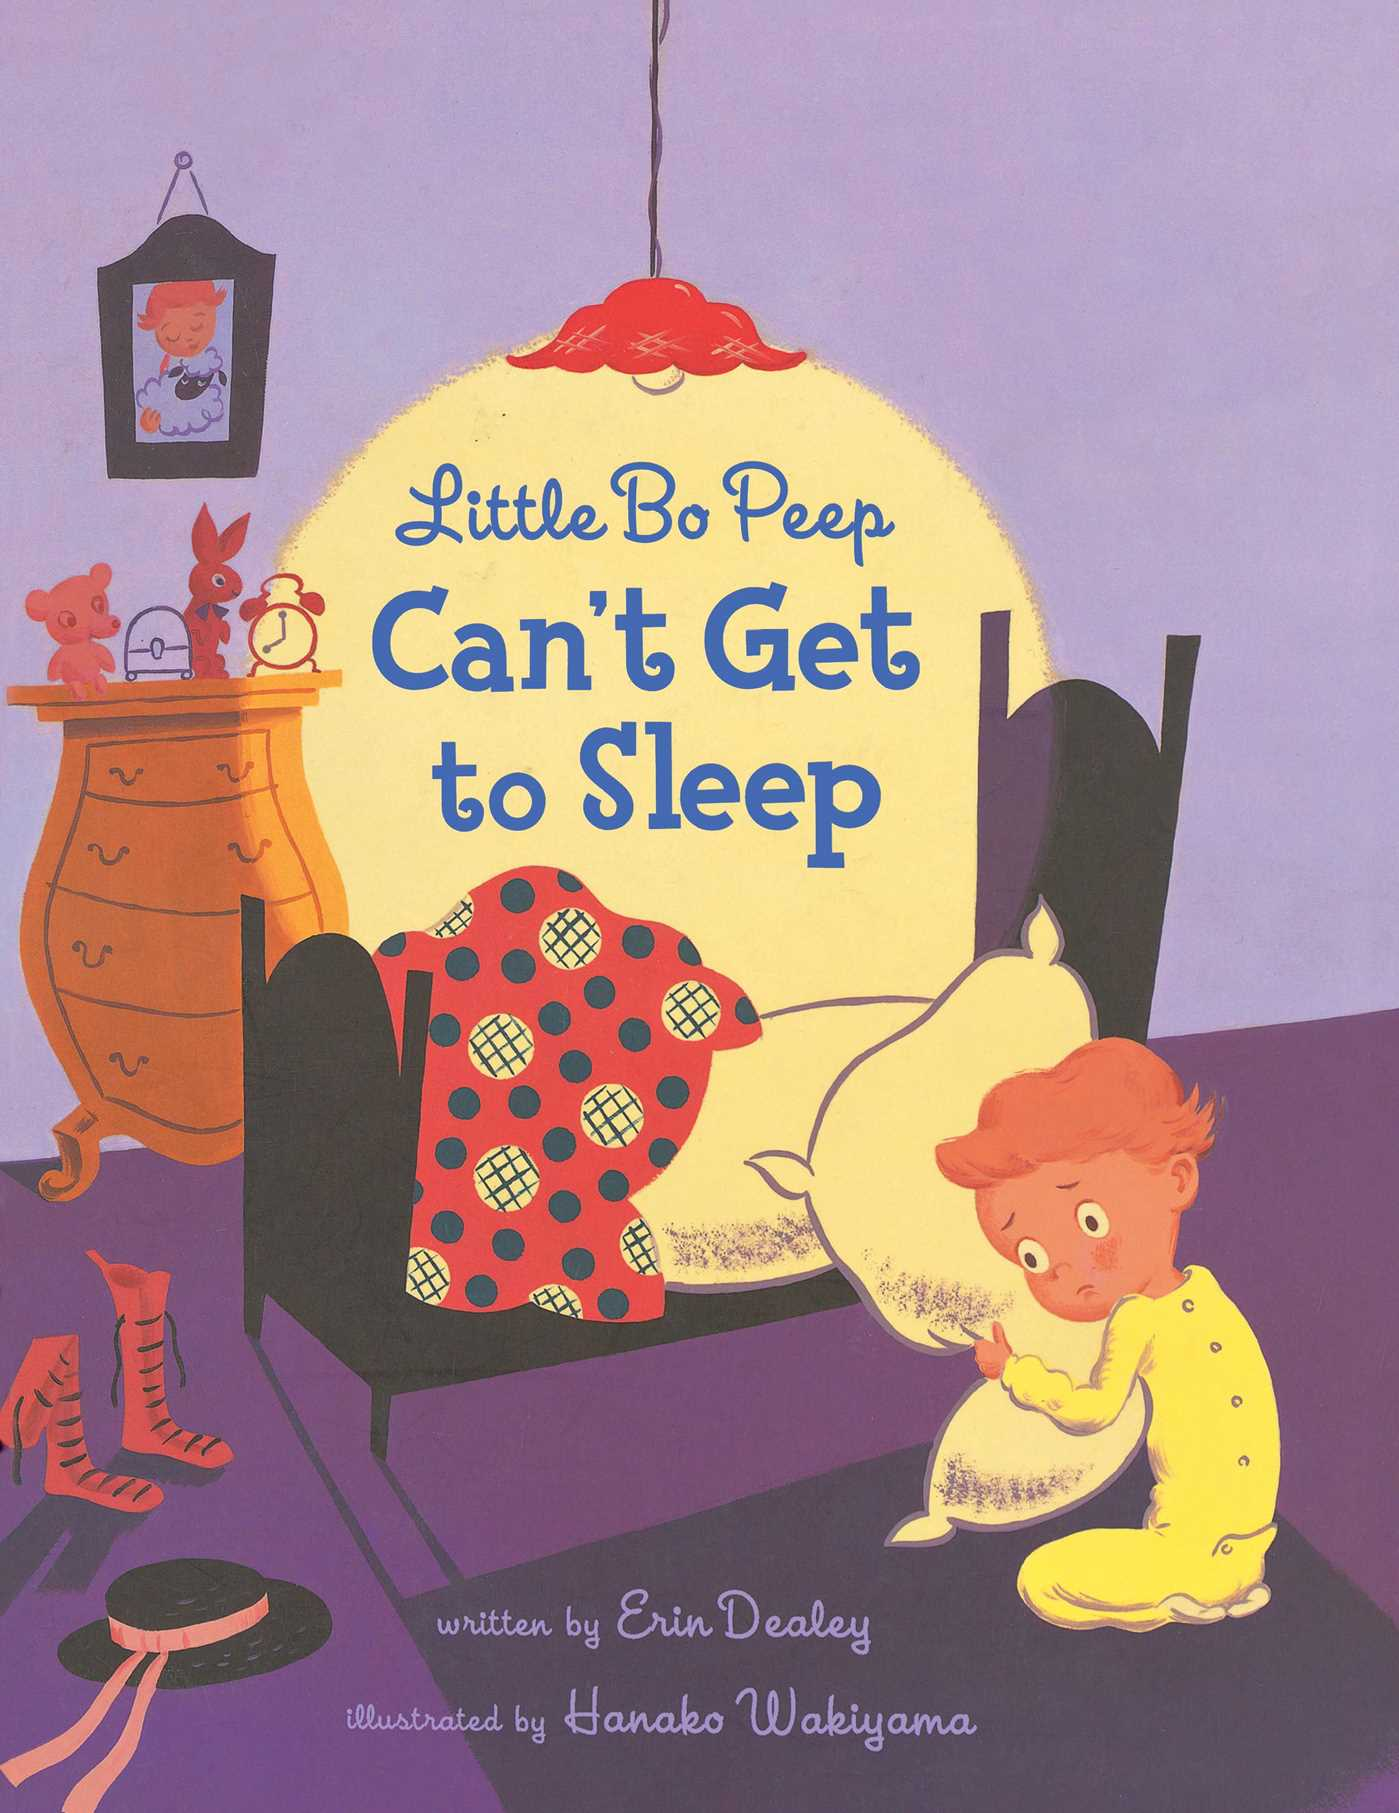 Little Bo Peep Can't Get to Sleep #erindealey